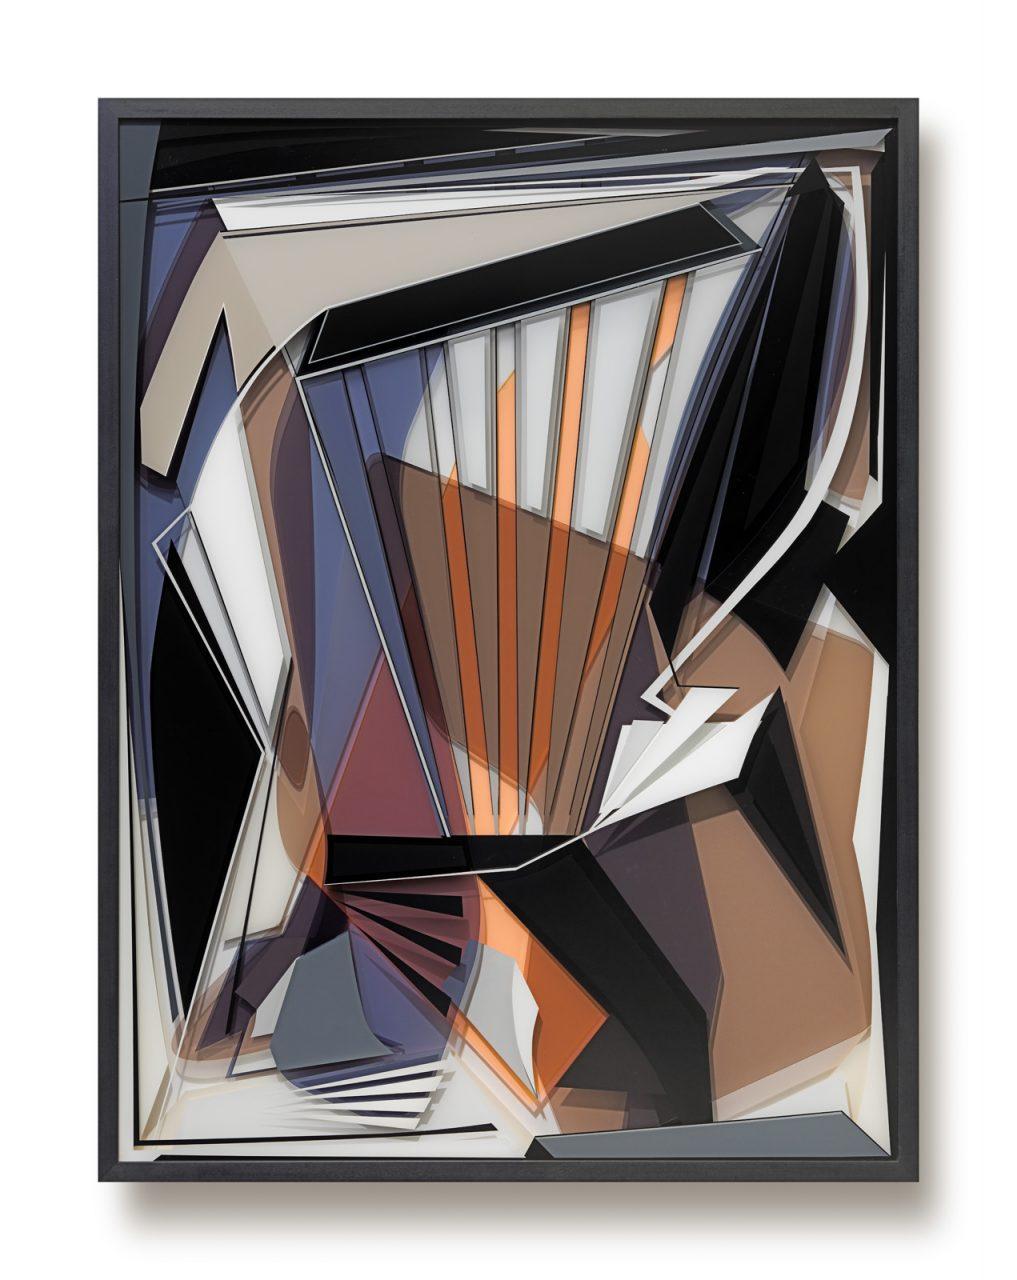 HOLDING ON (Maxxi, Rom), 2017, 100 x 75 cm